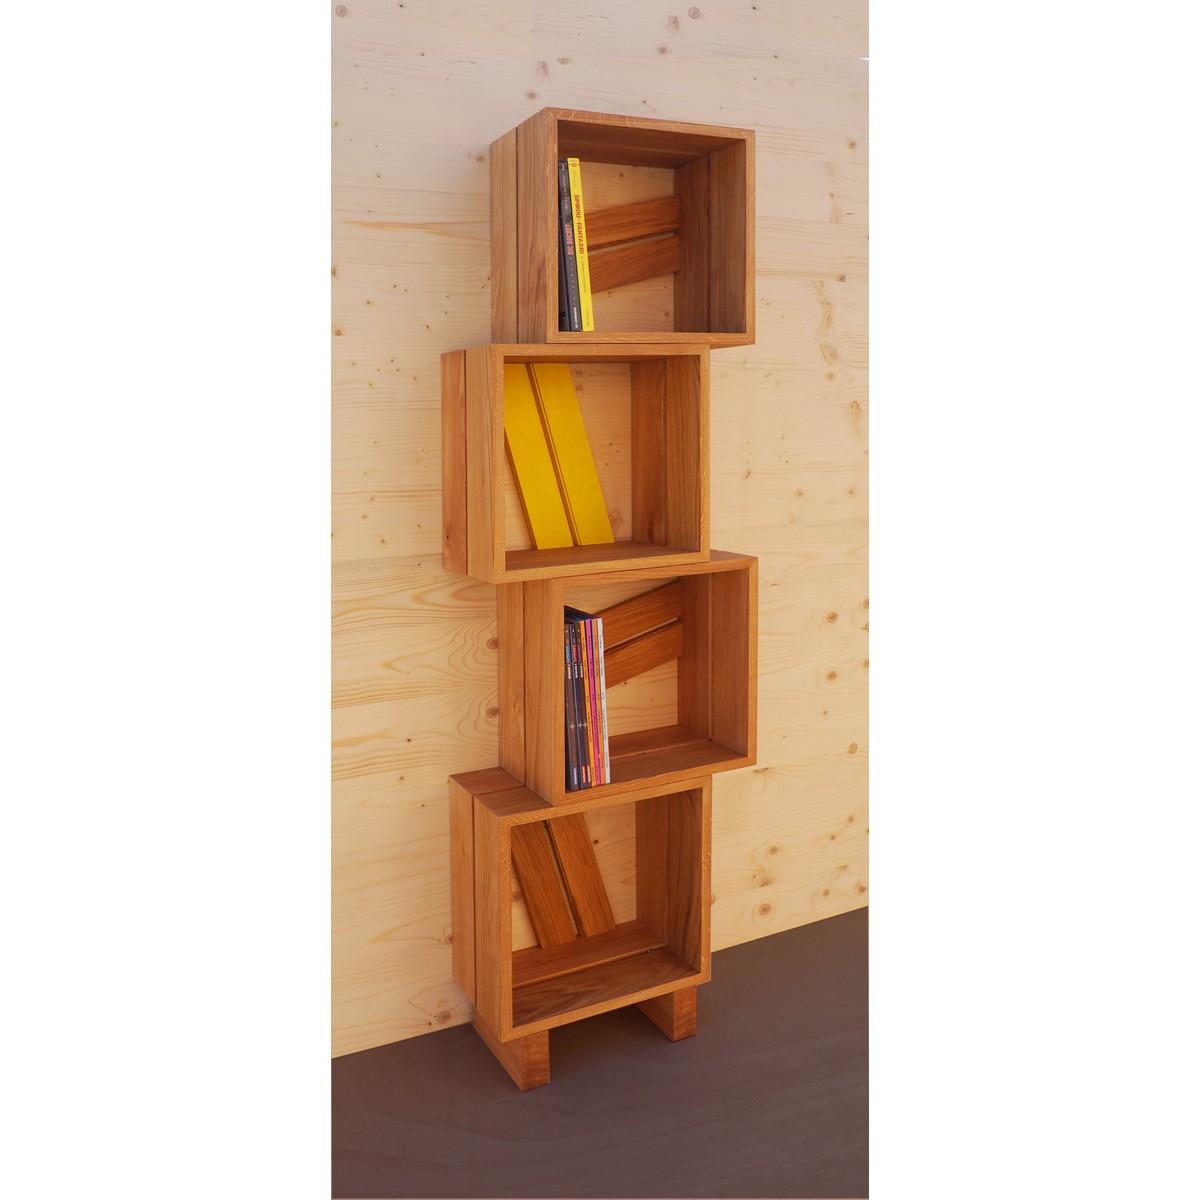 Meuble biblioth que modulable 4 casiers bois jaune gris blanc atelier mobibois - Bibliotheque meuble modulable ...